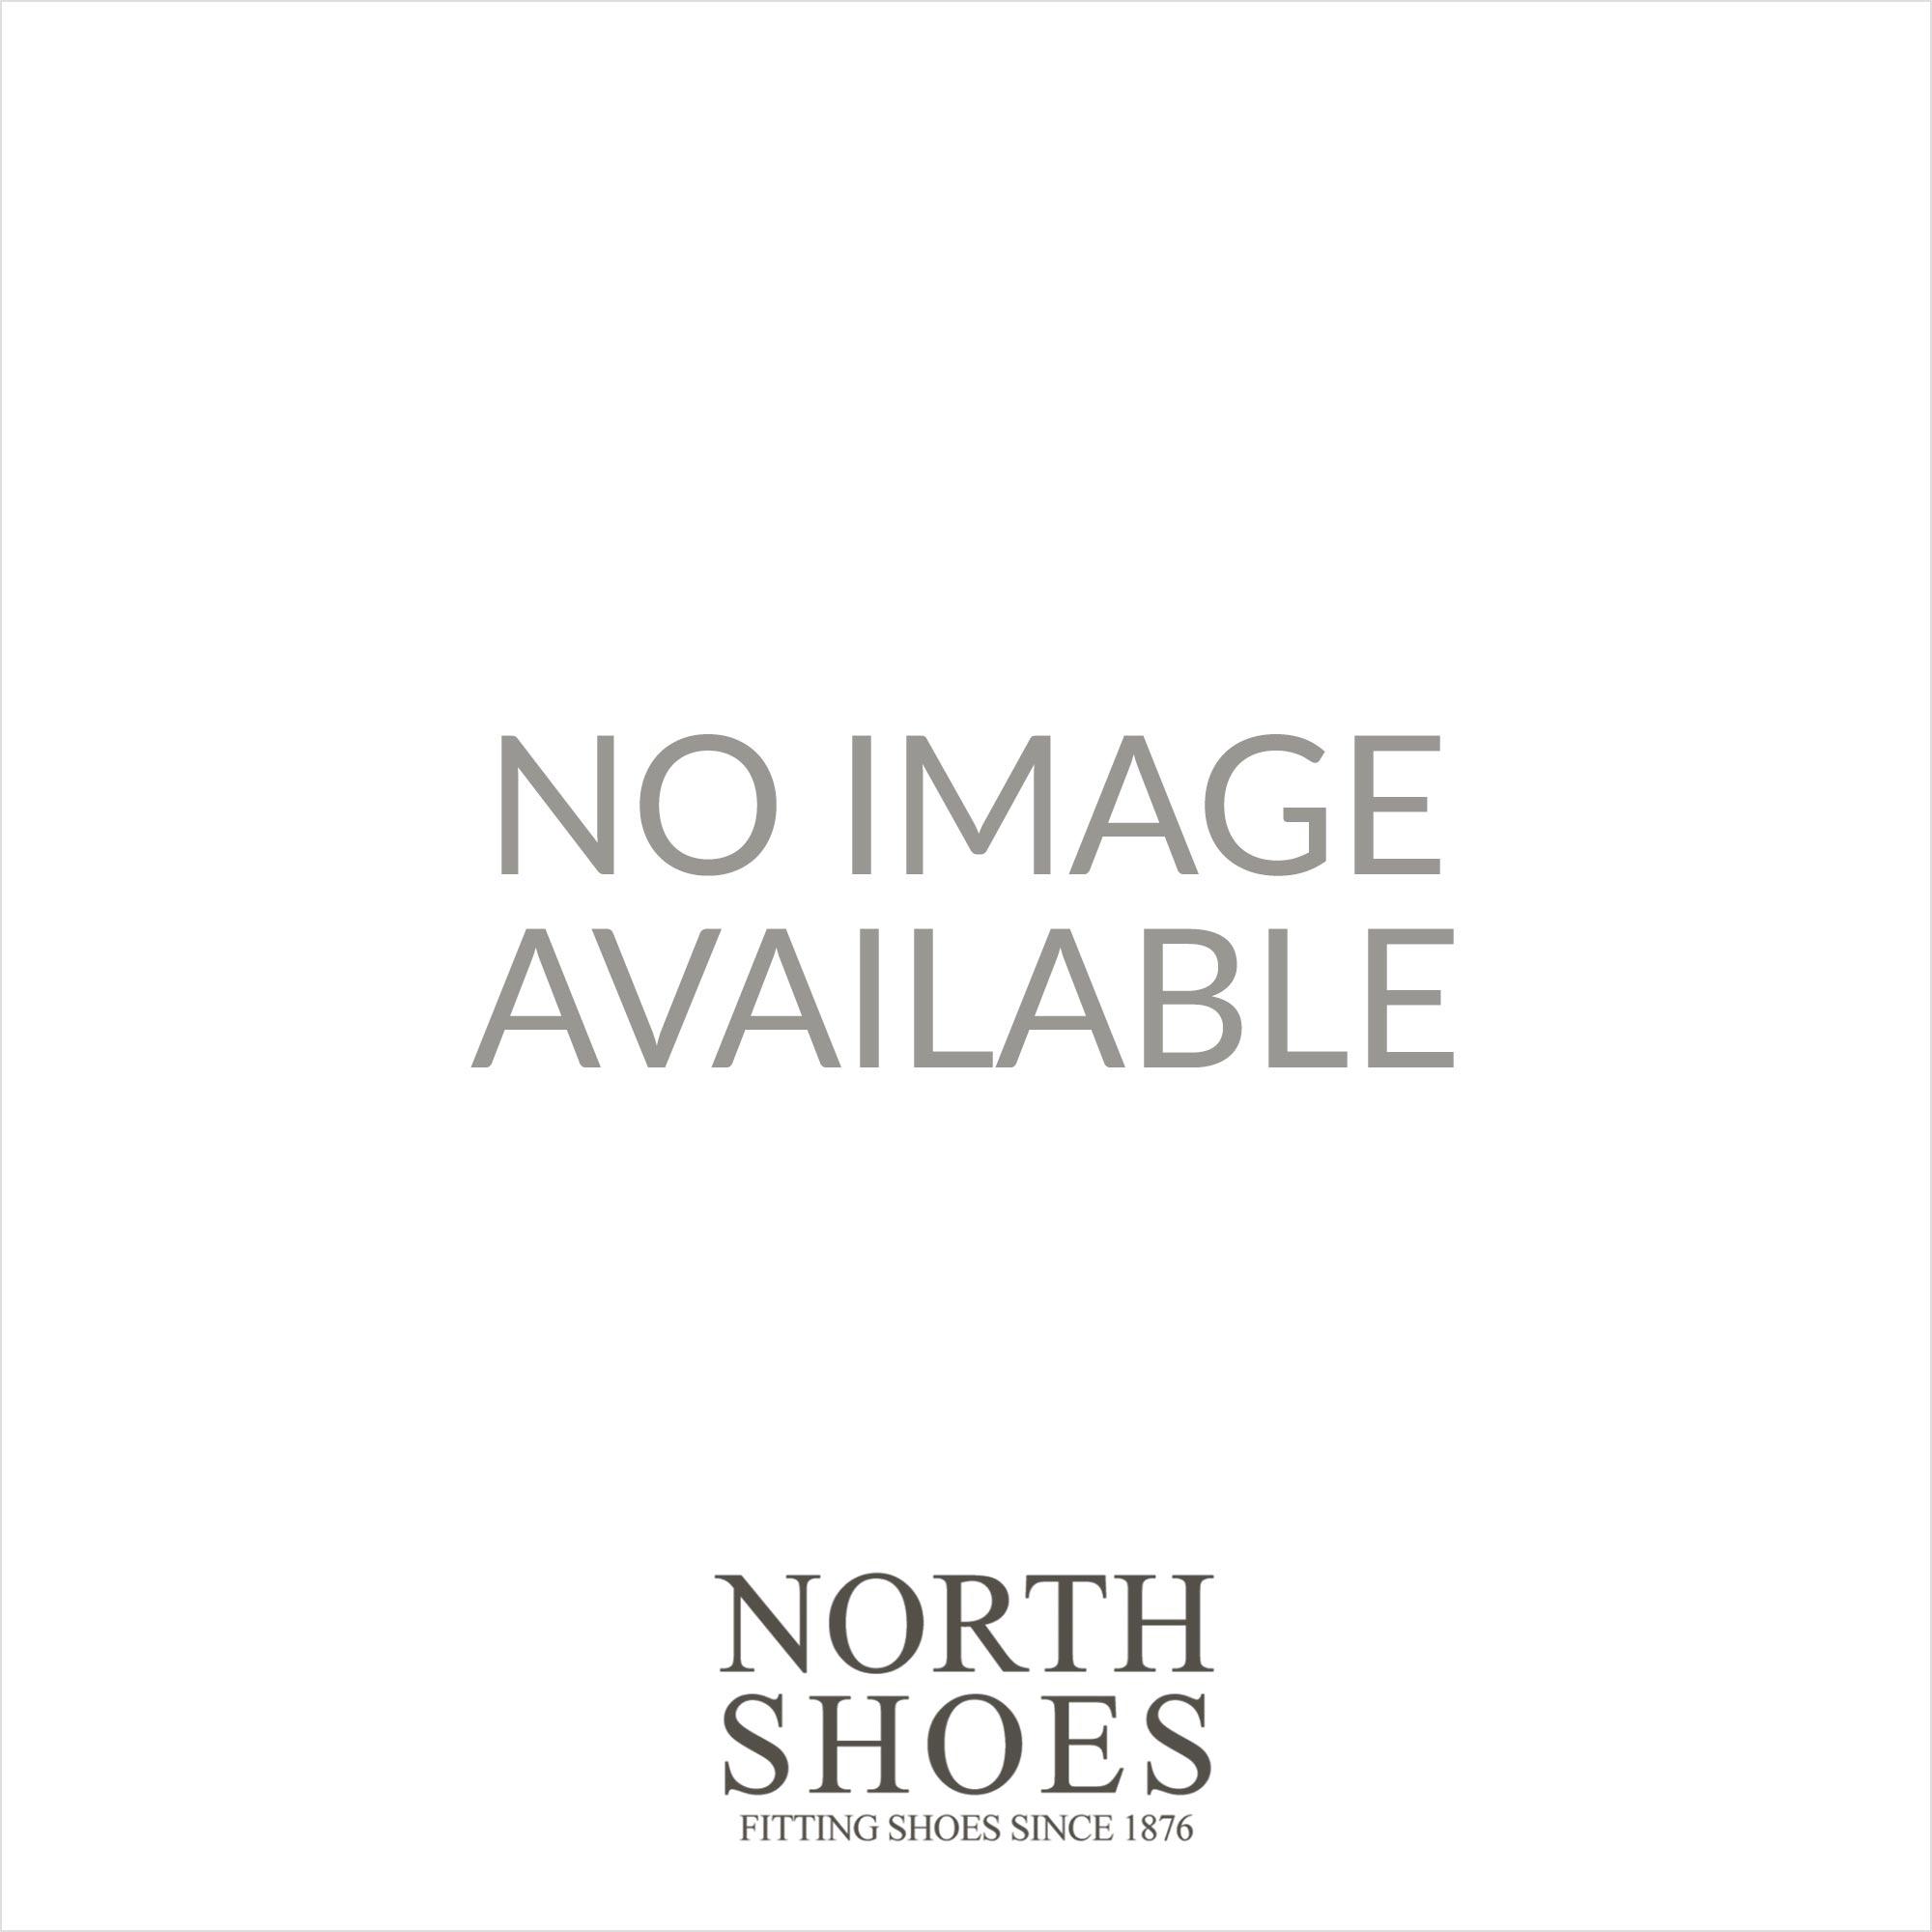 0ec3260bf826 Birkenstock Mayari Brown Leather Slip On Womens Mule Sandal - Birkenstock  from North Shoes UK